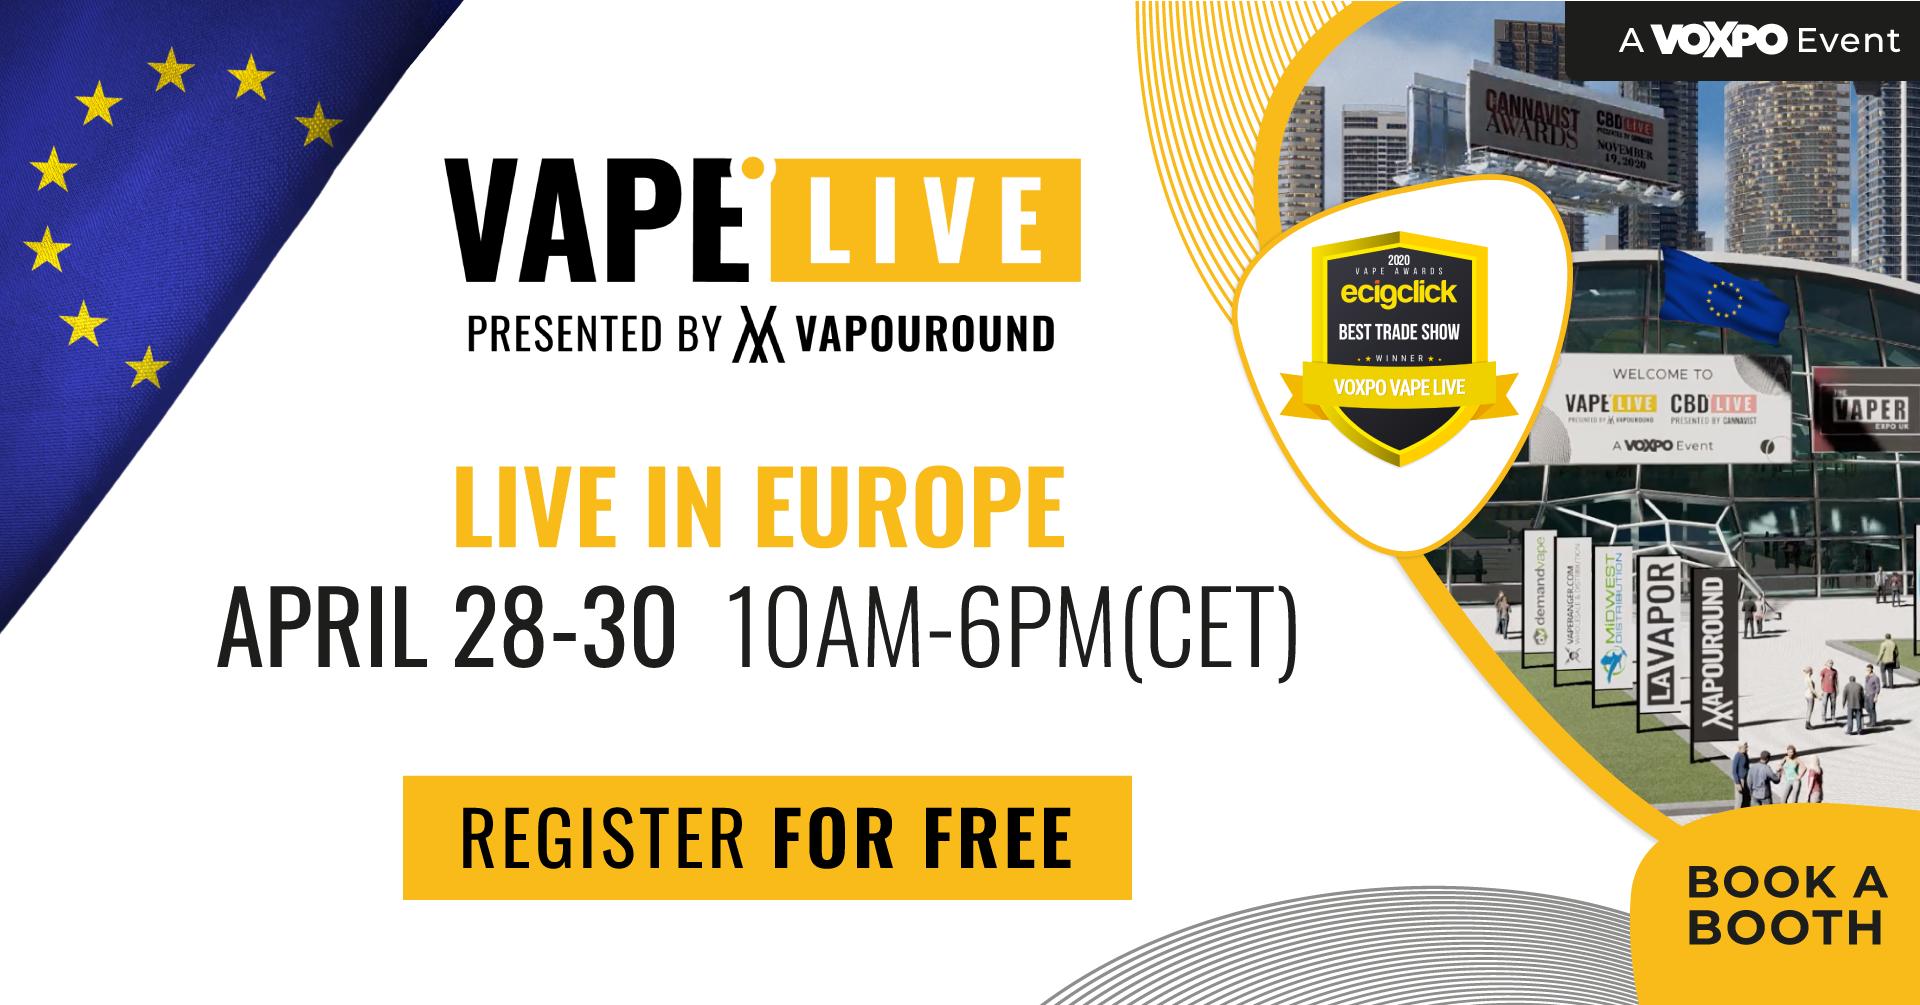 vape live europe - a voxpo event